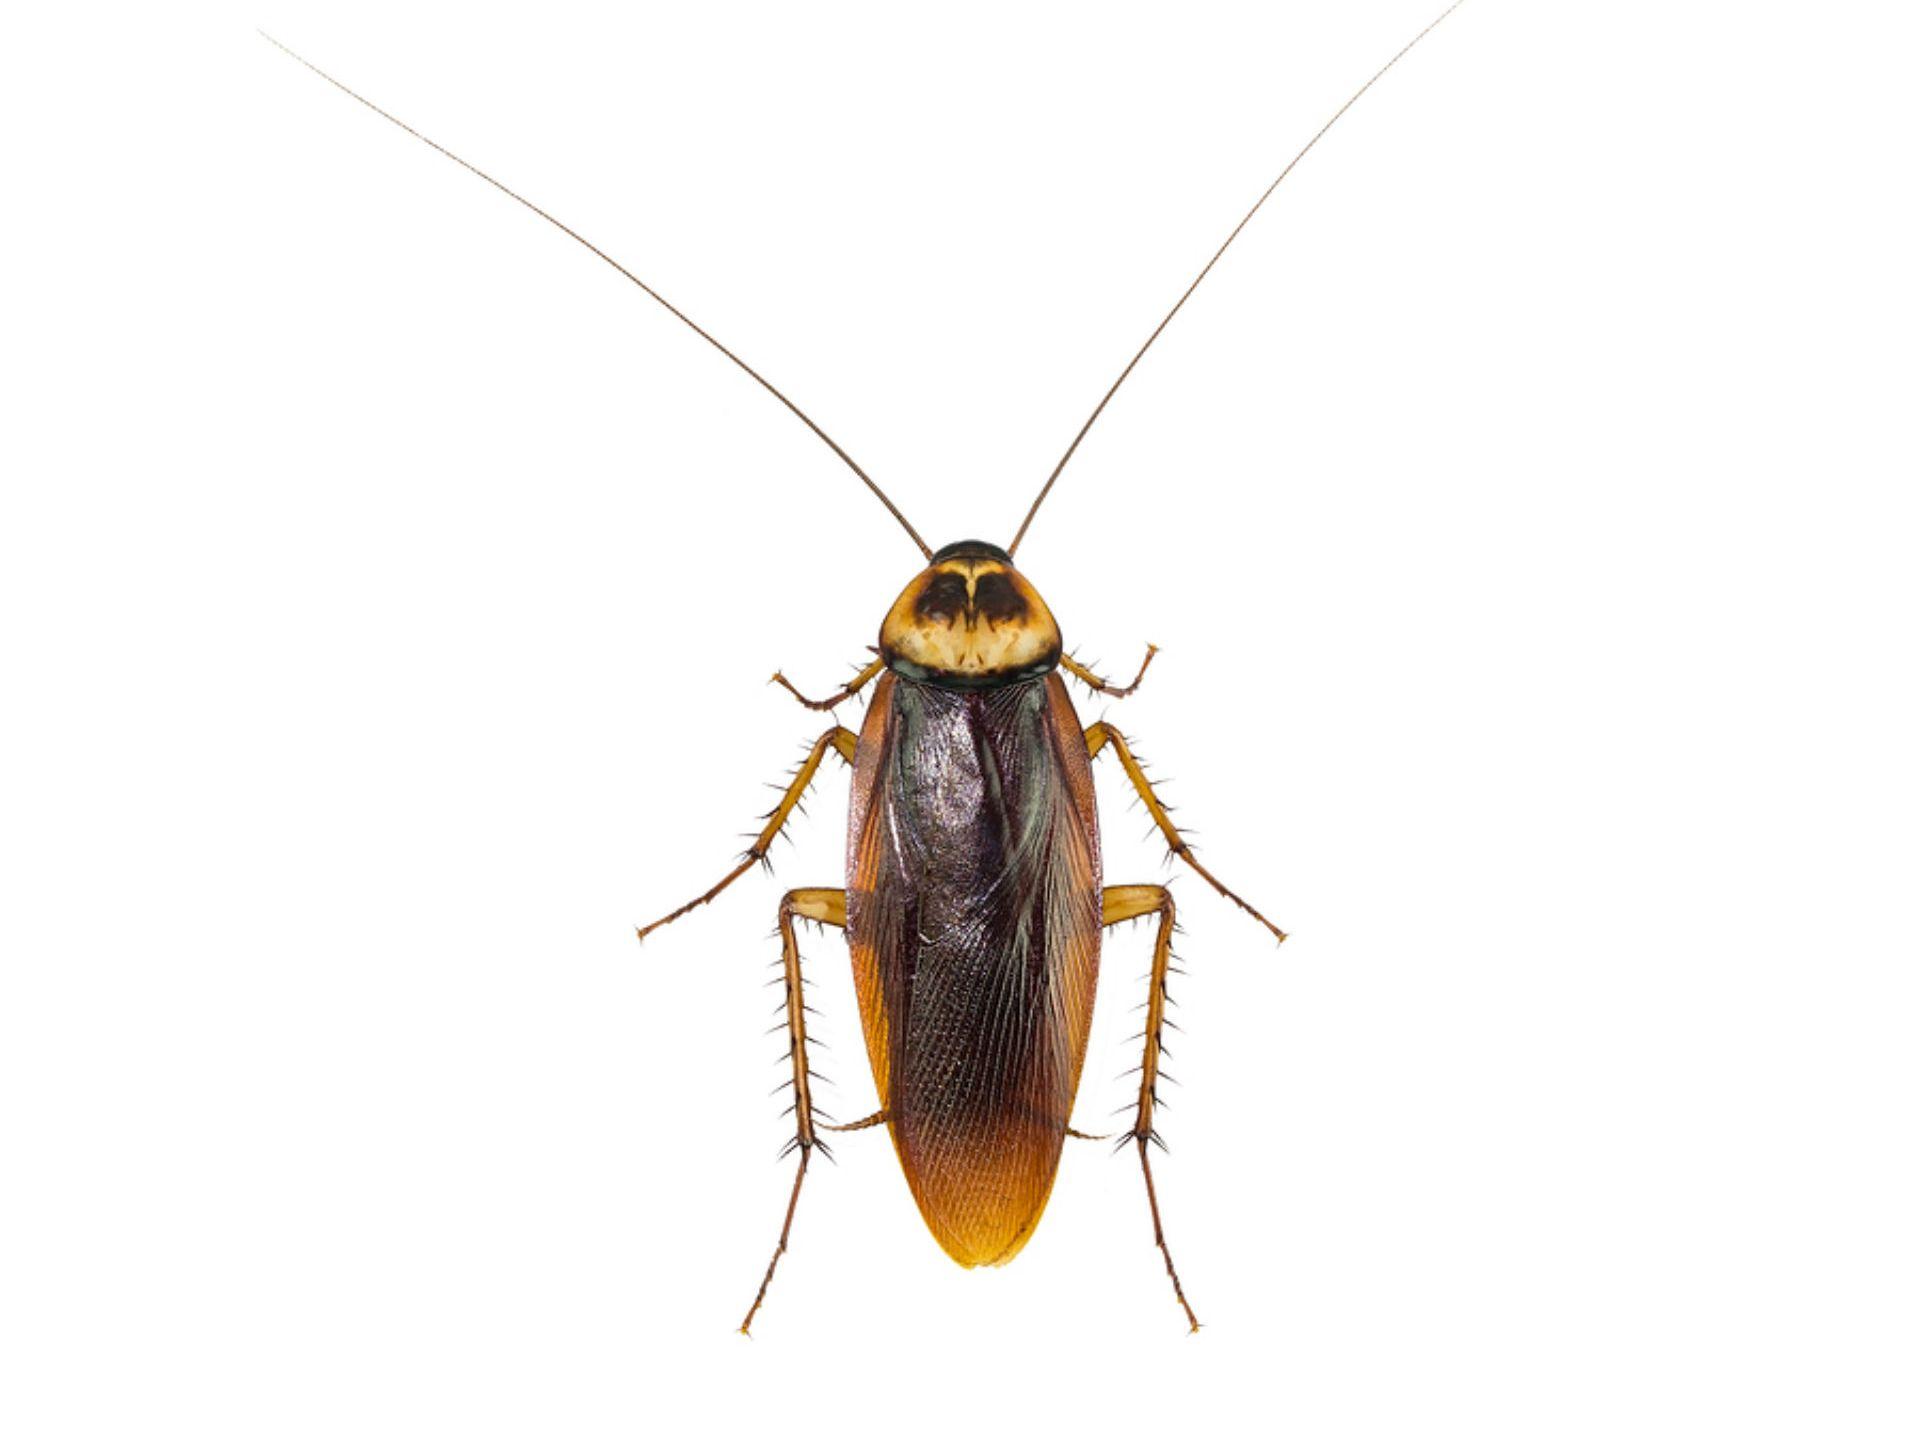 cockroaches _1549634951470.jpg.jpg